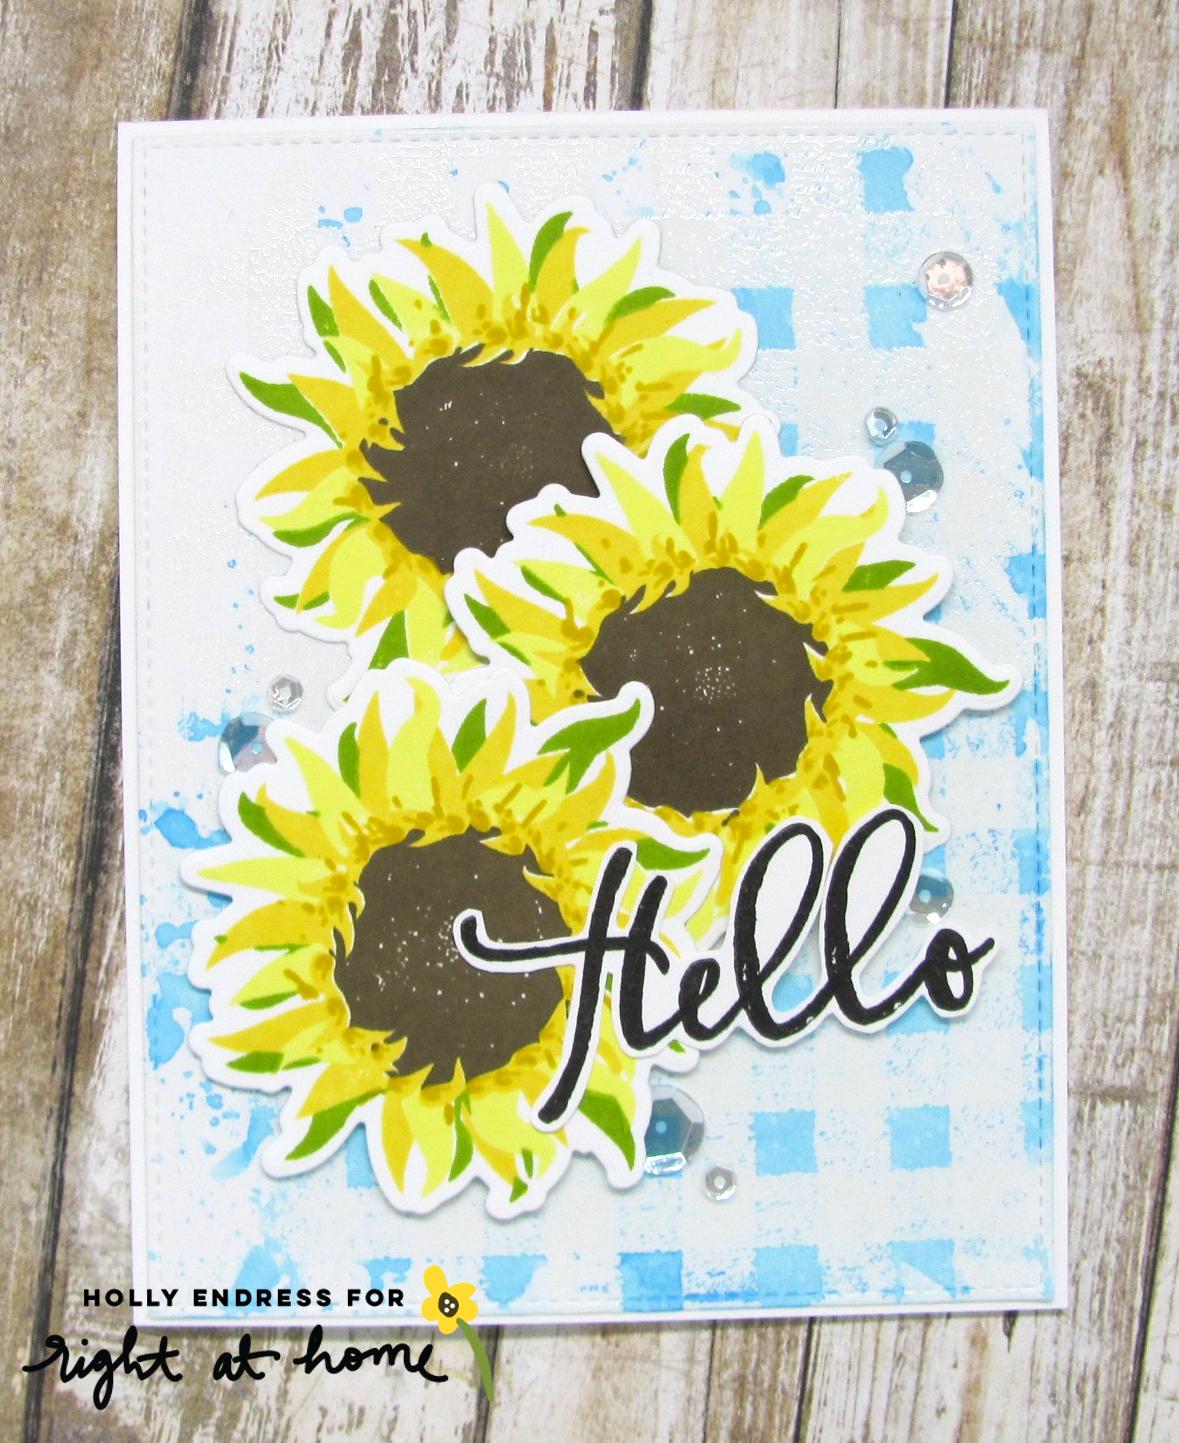 Hello Sunflower Brushstroke Alphabet Card by Holly // rightathomeshop.com/blog